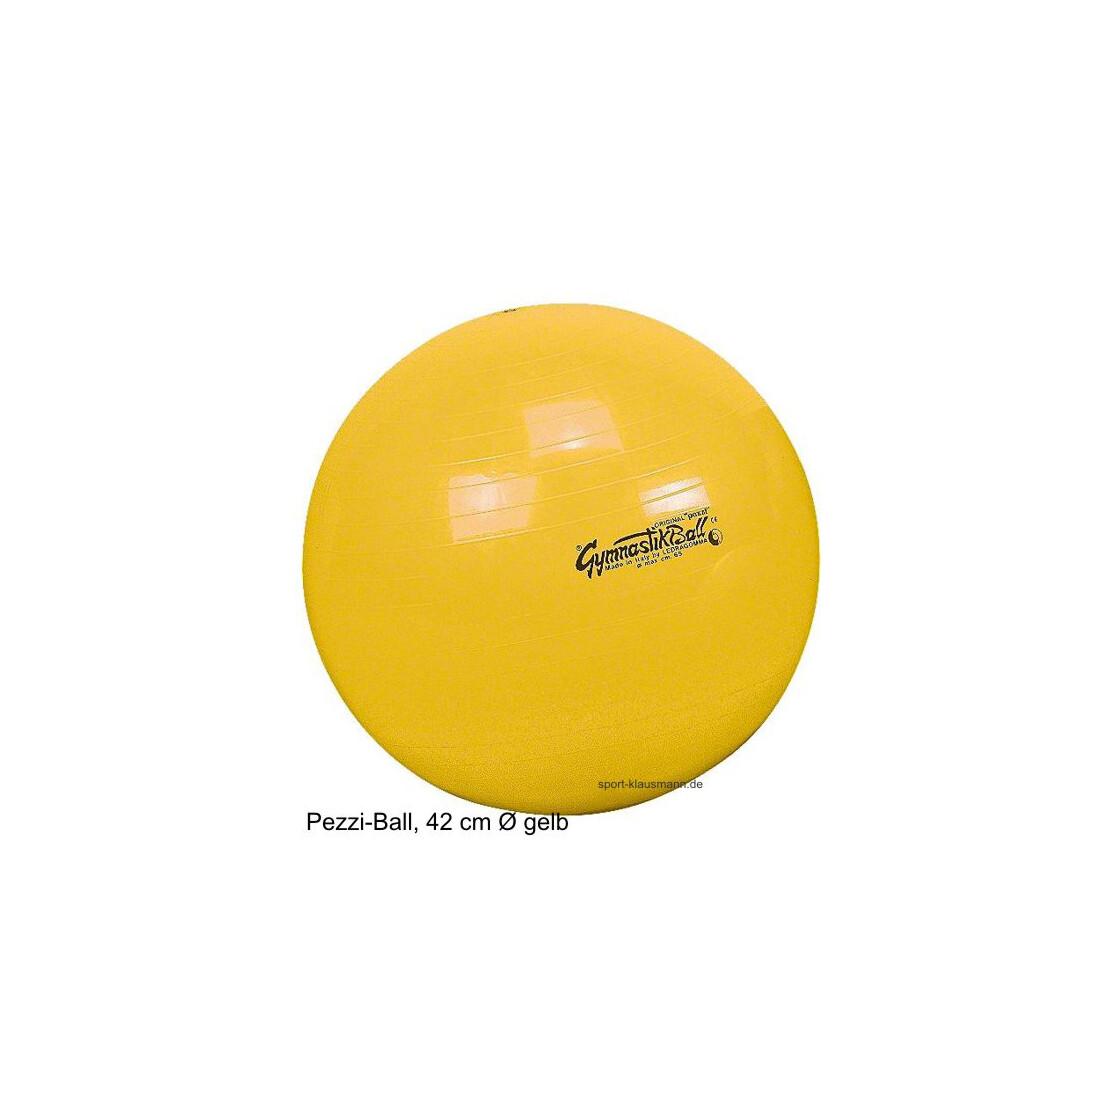 pezzi gymnastikball sitzball 42 cm gelb outdoor ausr stung ruc. Black Bedroom Furniture Sets. Home Design Ideas